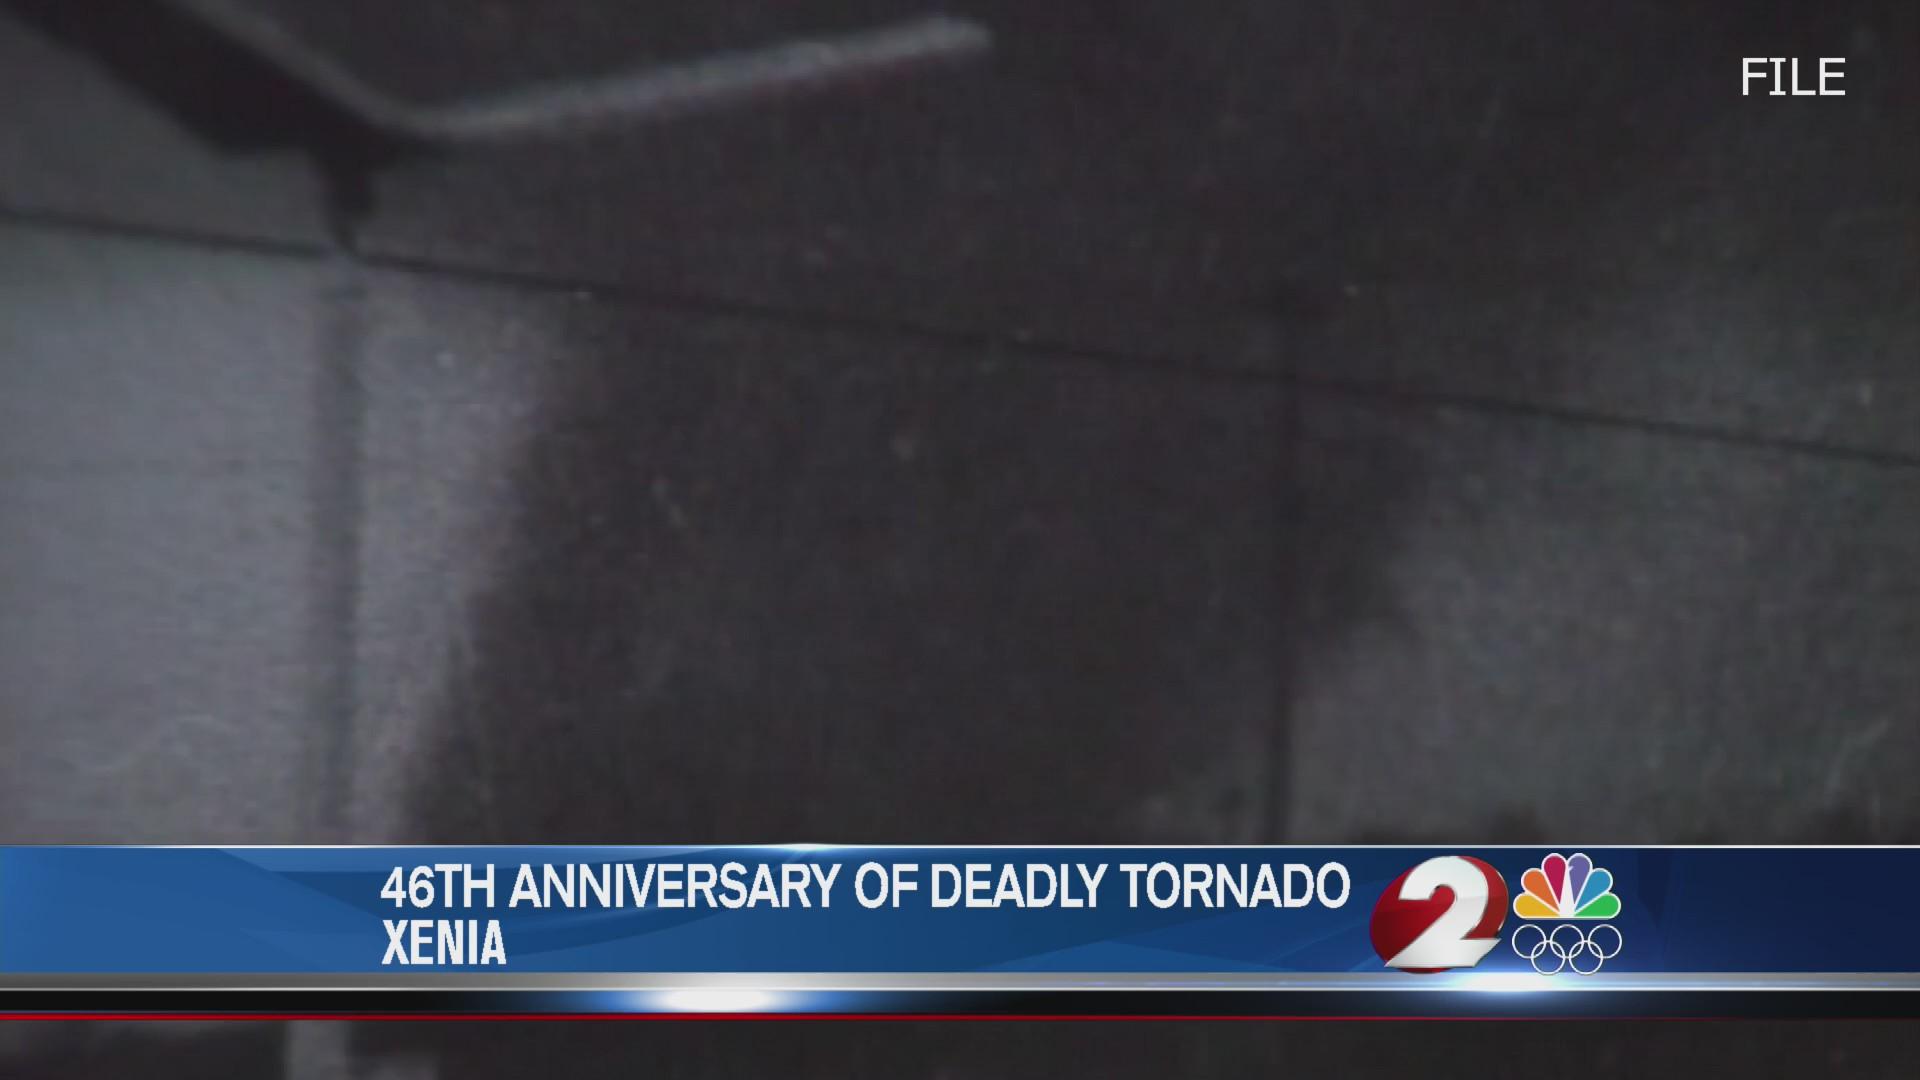 Xenia tornado anniversary